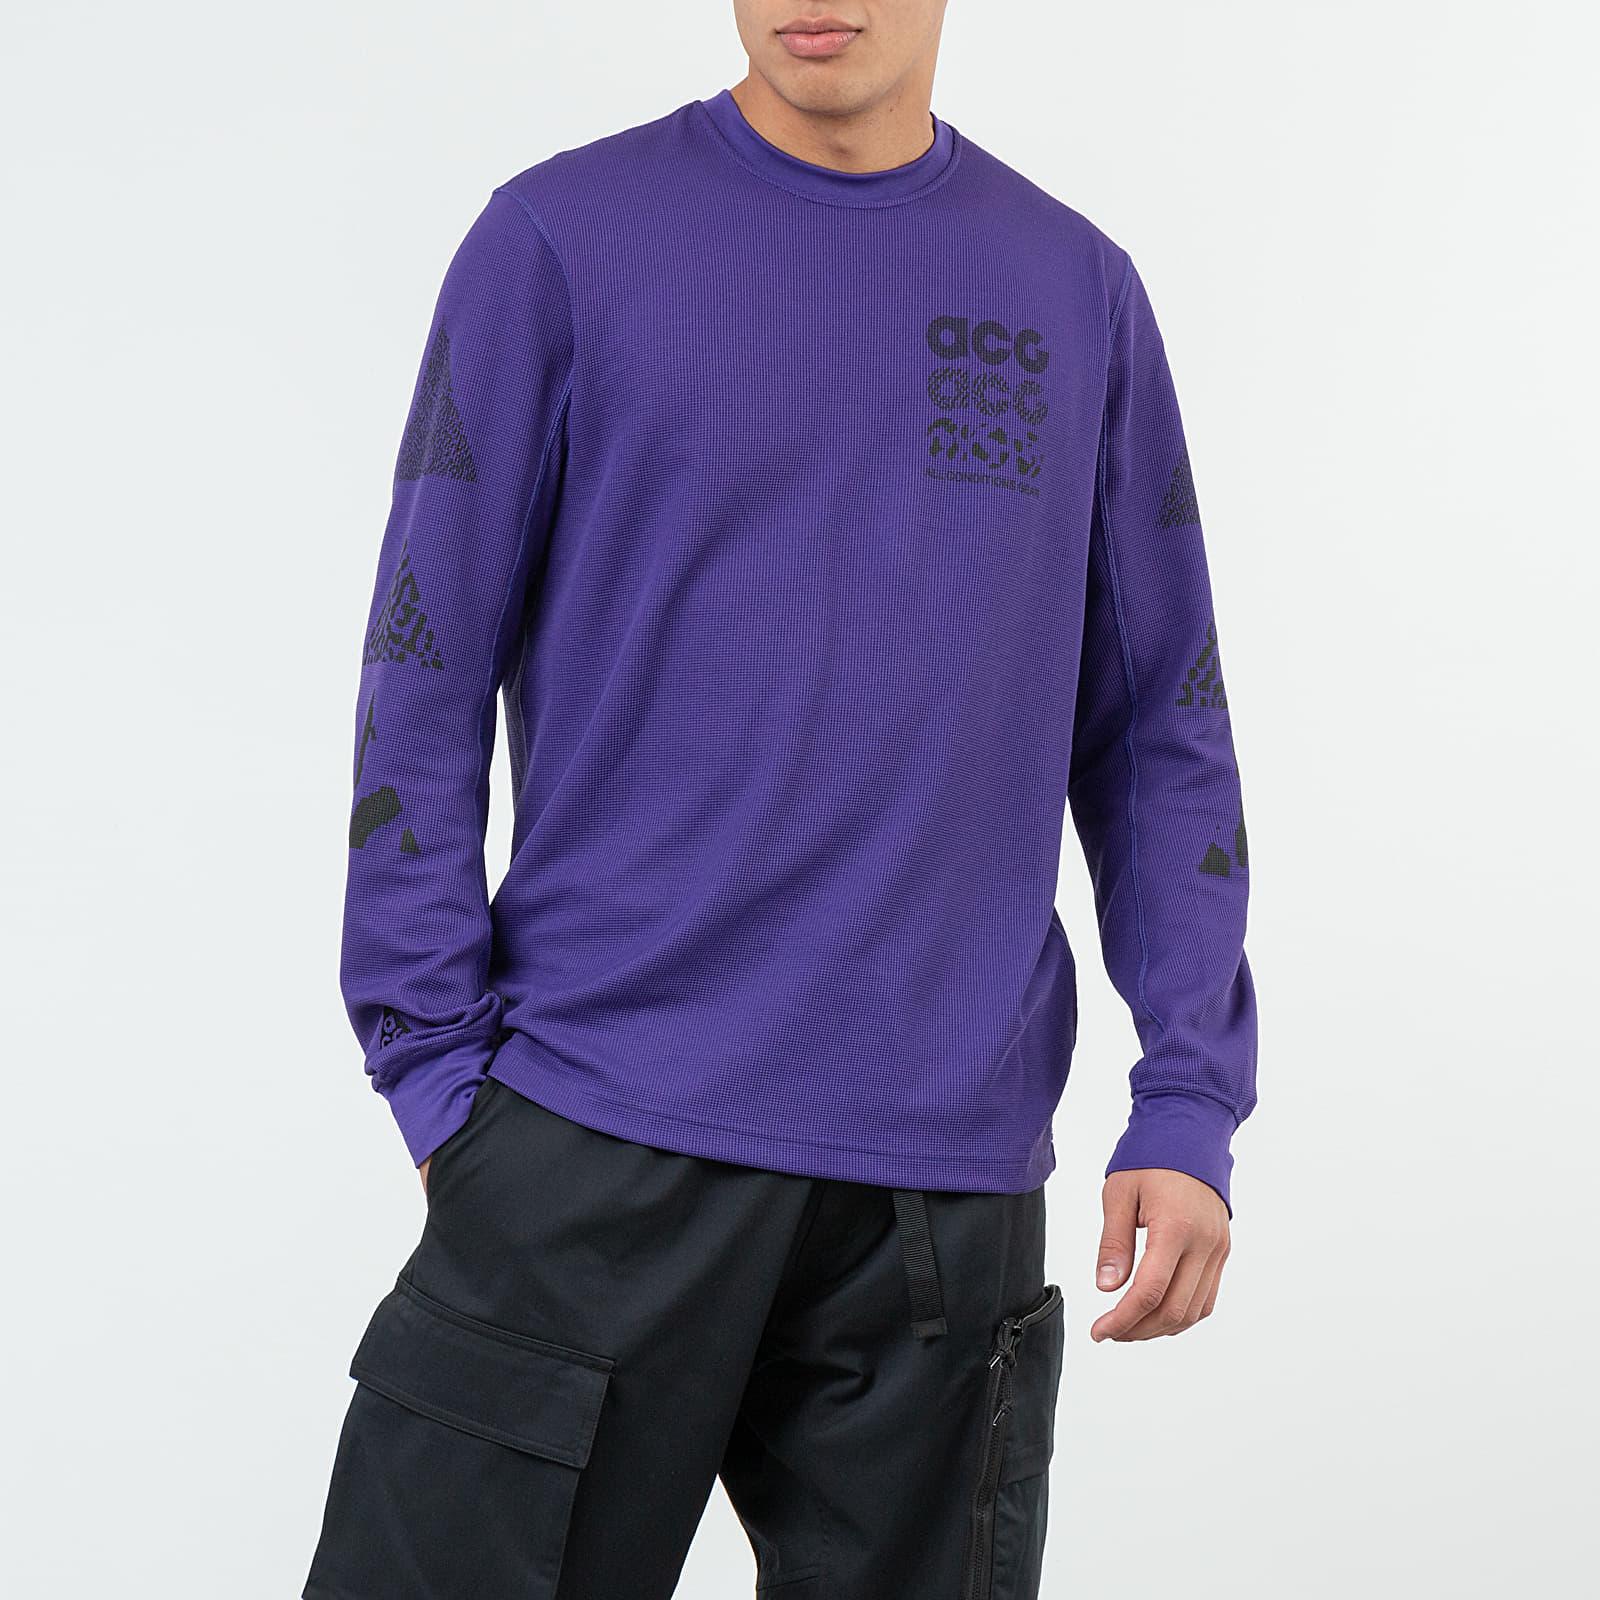 Nike ACG Knit Long Sleeve Tee